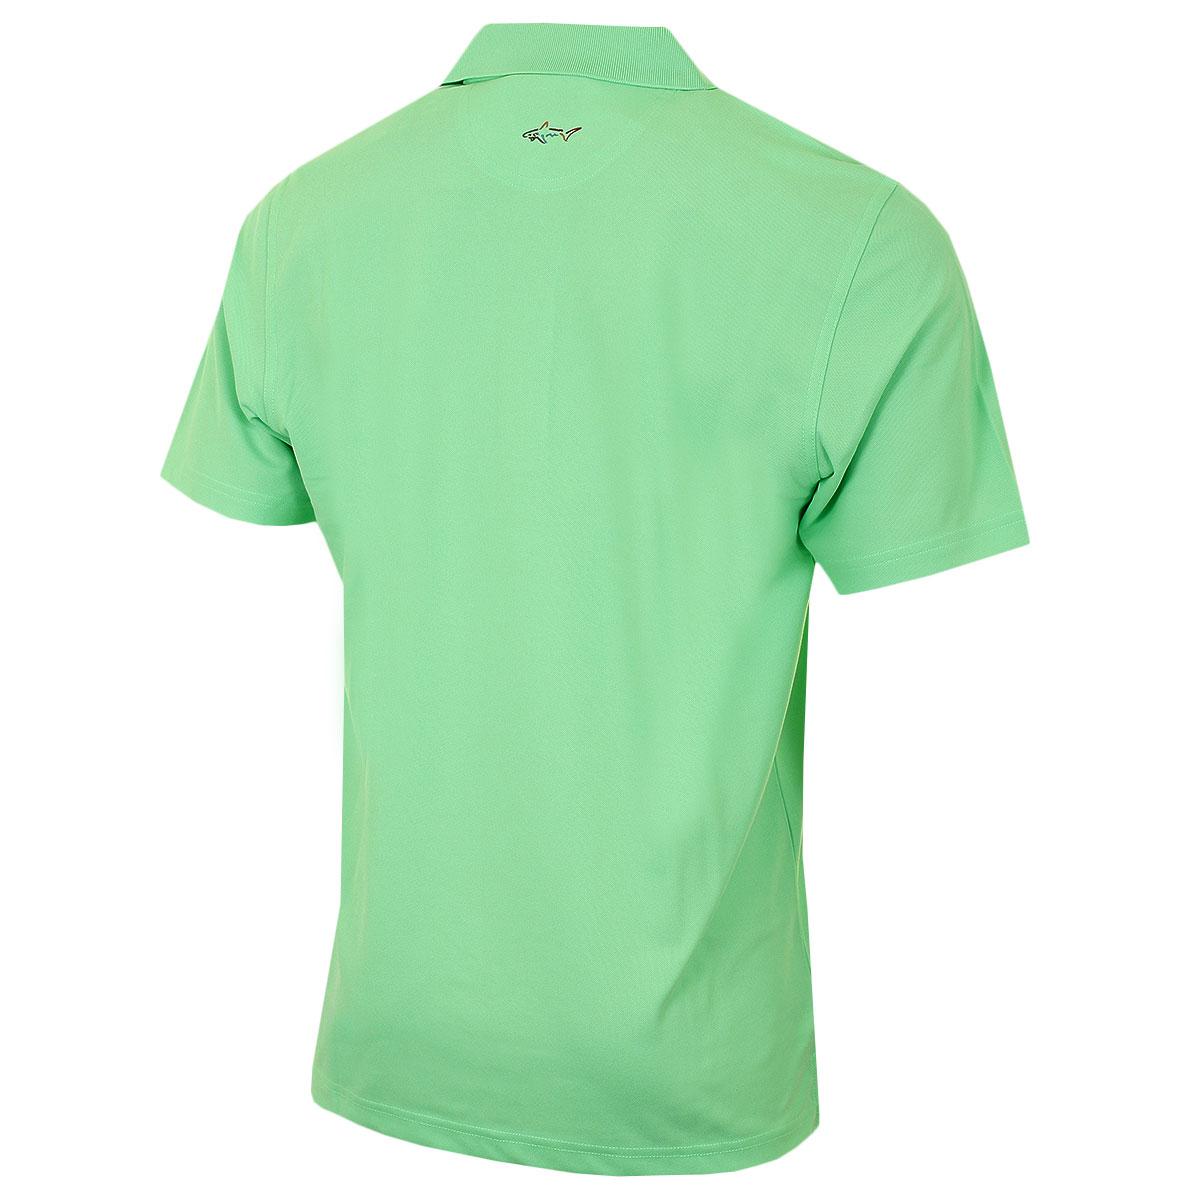 Greg-Norman-Mens-KX04-Performance-Micro-Pique-Golf-Polo-Shirt-28-OFF-RRP thumbnail 35